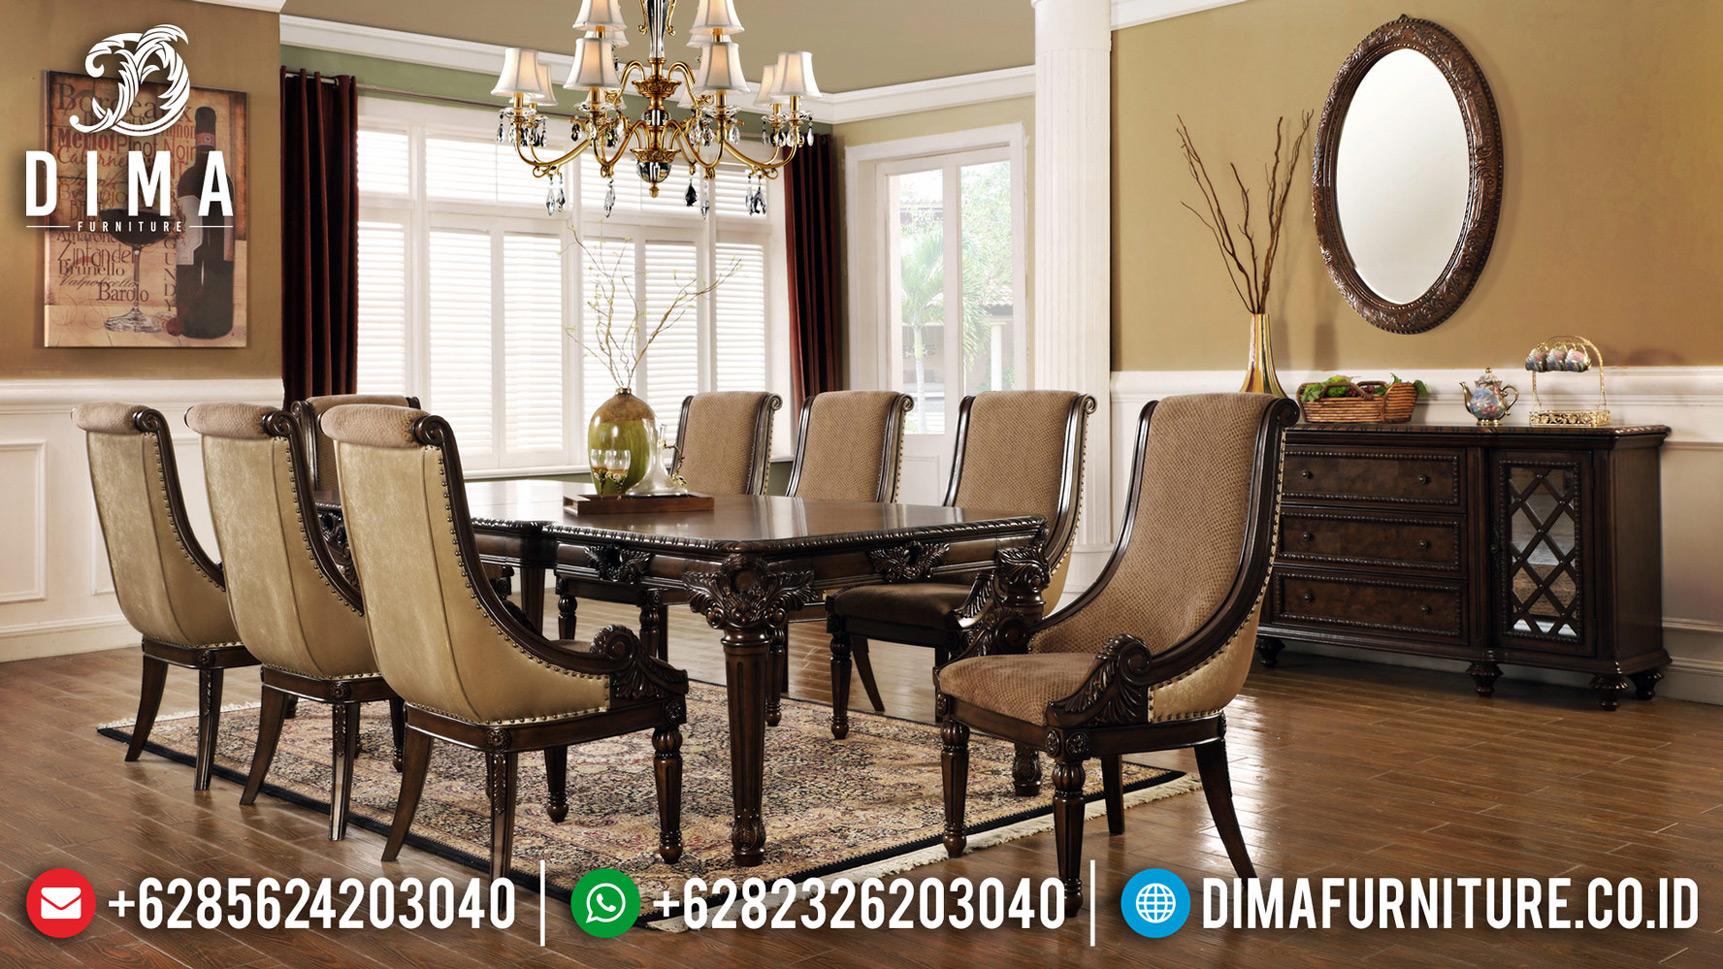 New Set Meja Makan Minimalis Jati Classic Luxury Carving Furniture Jepara BT-0669